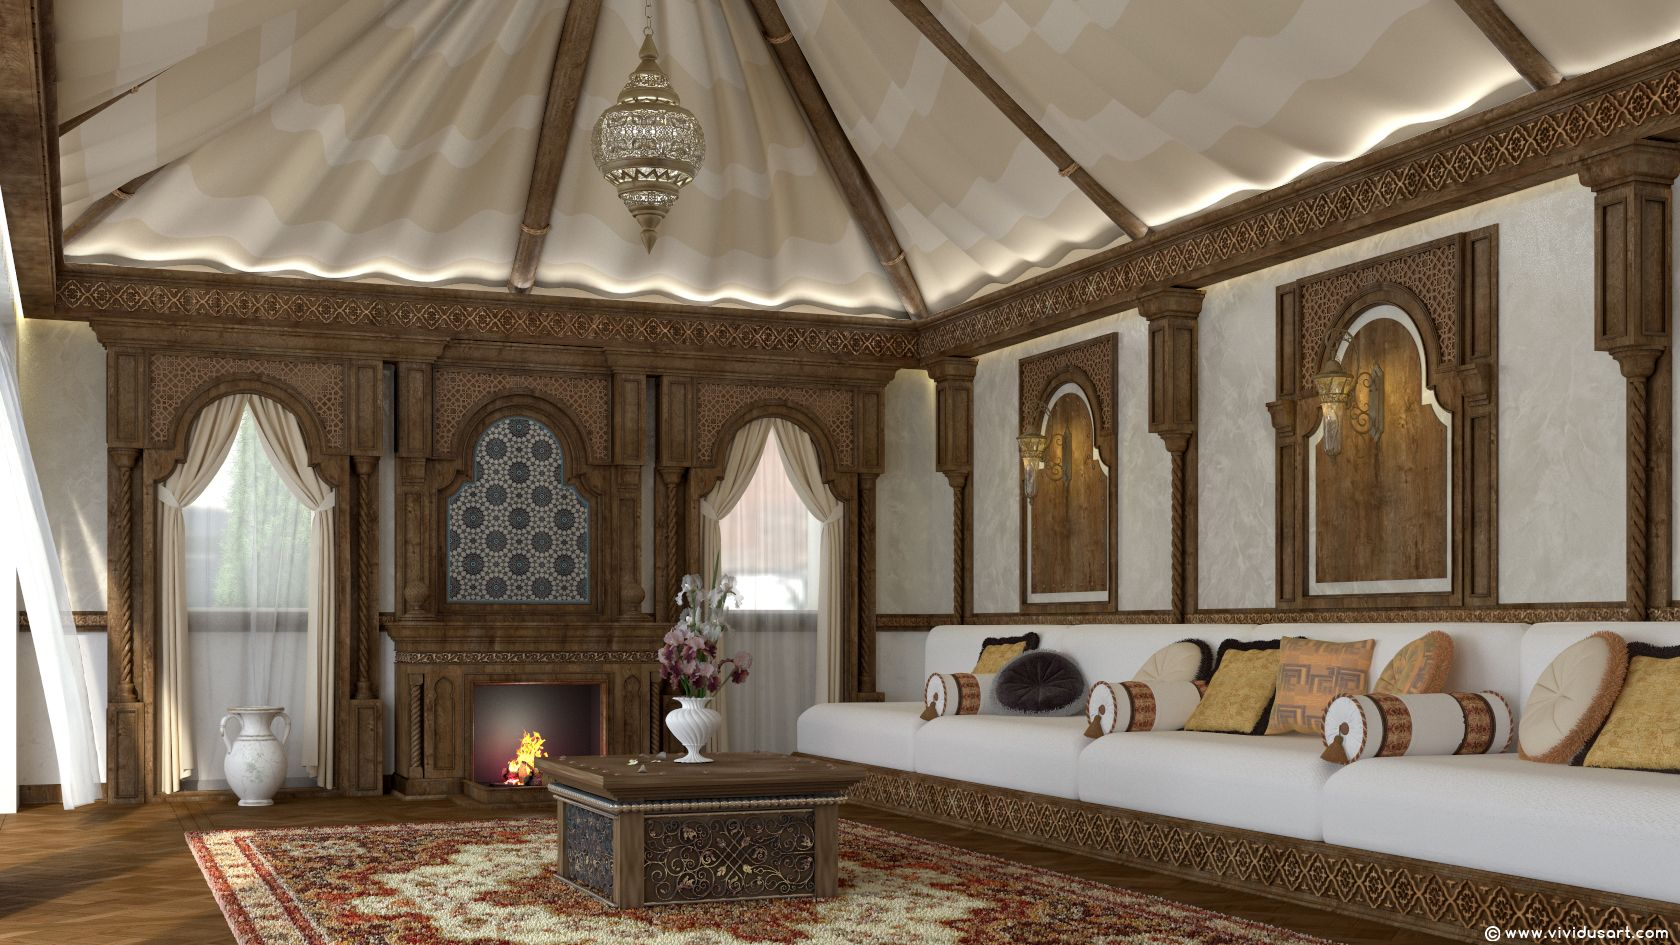 تصميم داخلي طراز عربي تقليدي Vividusart Interior Traditional Islamic Designed By Vividus Doha Qatar Classic Interior Design Interior Design